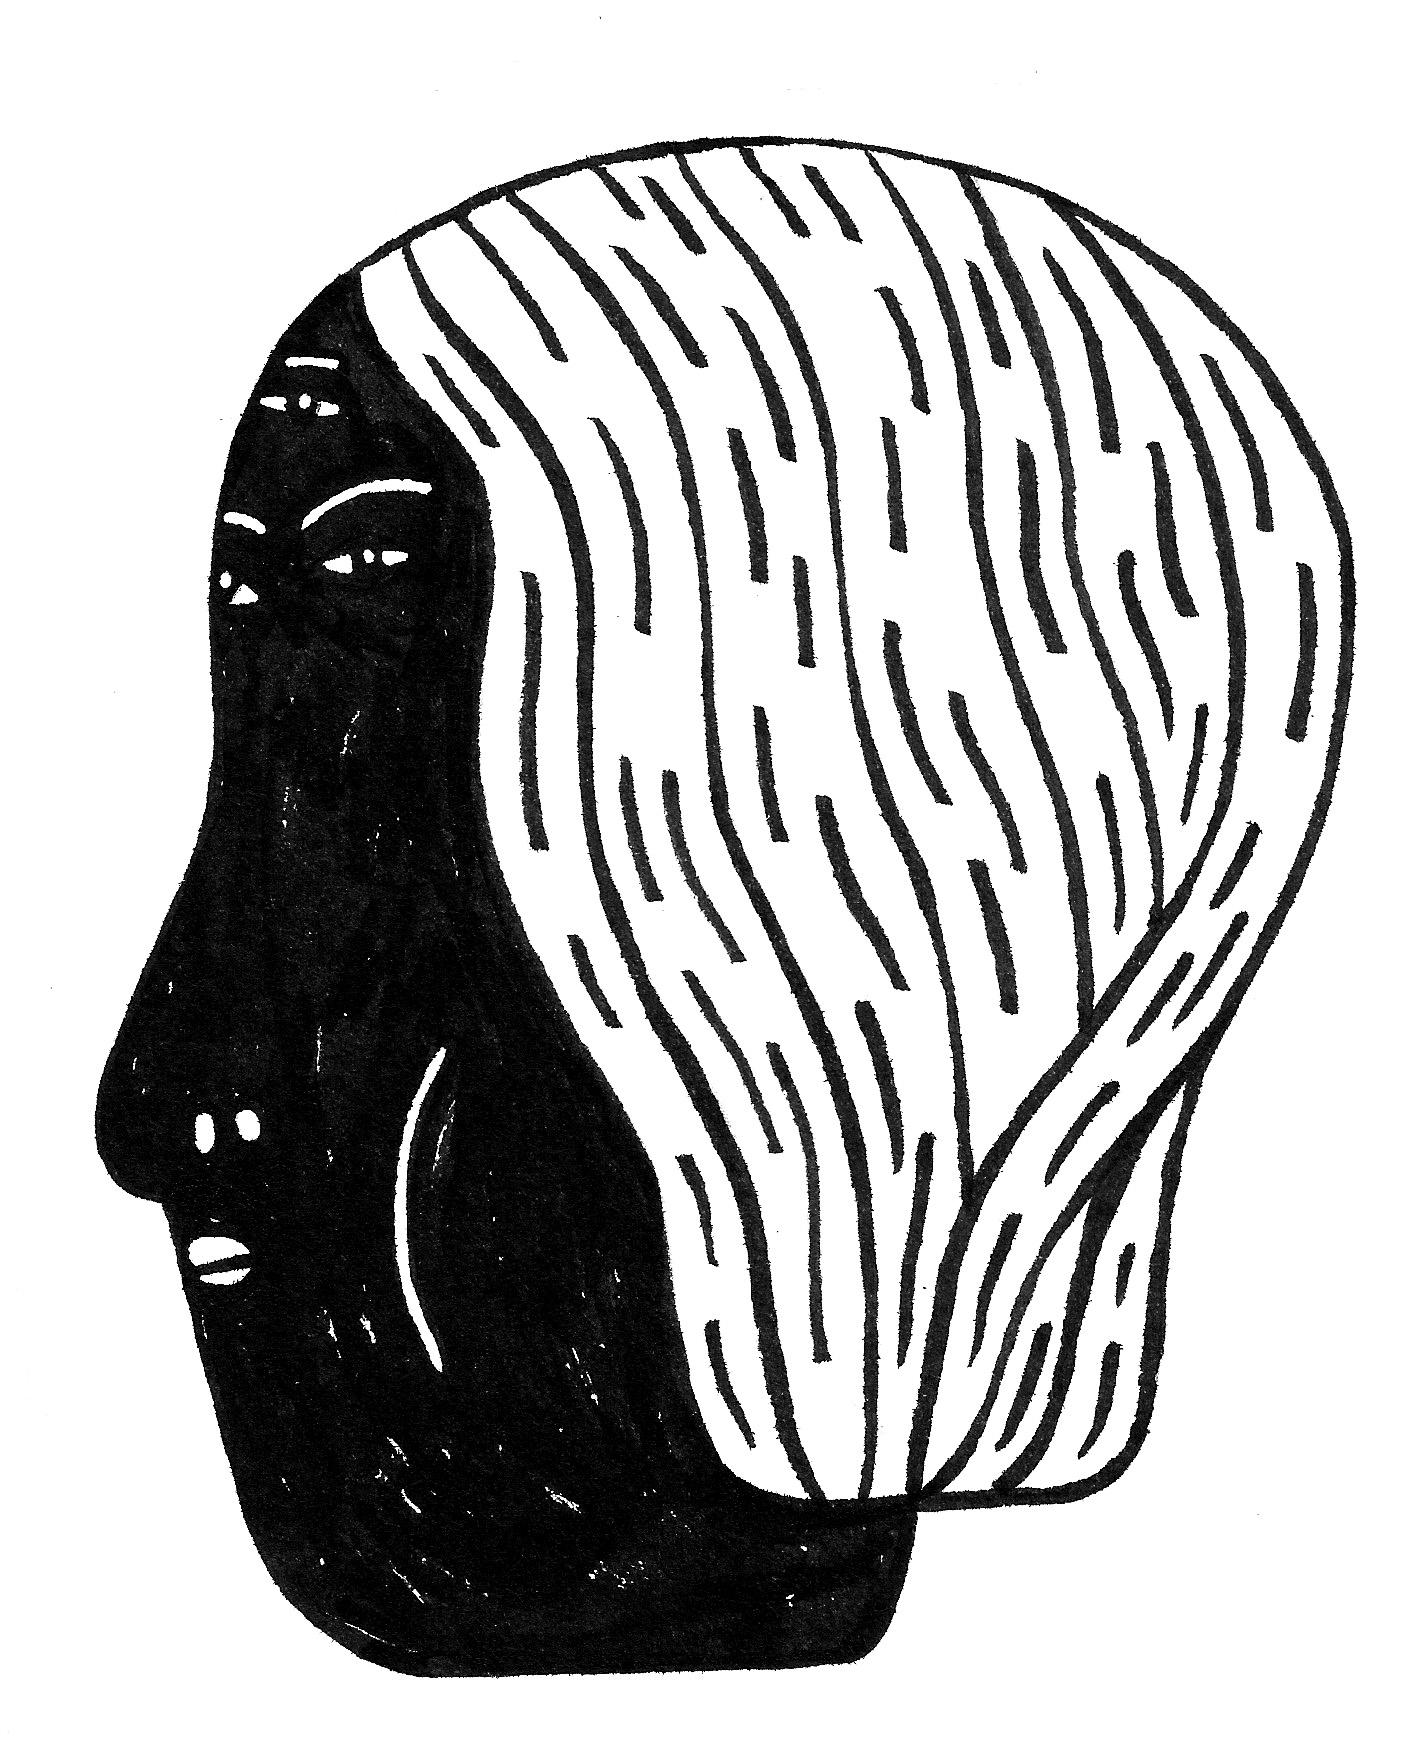 drawing ink byw - mvictoriarodriguez | ello